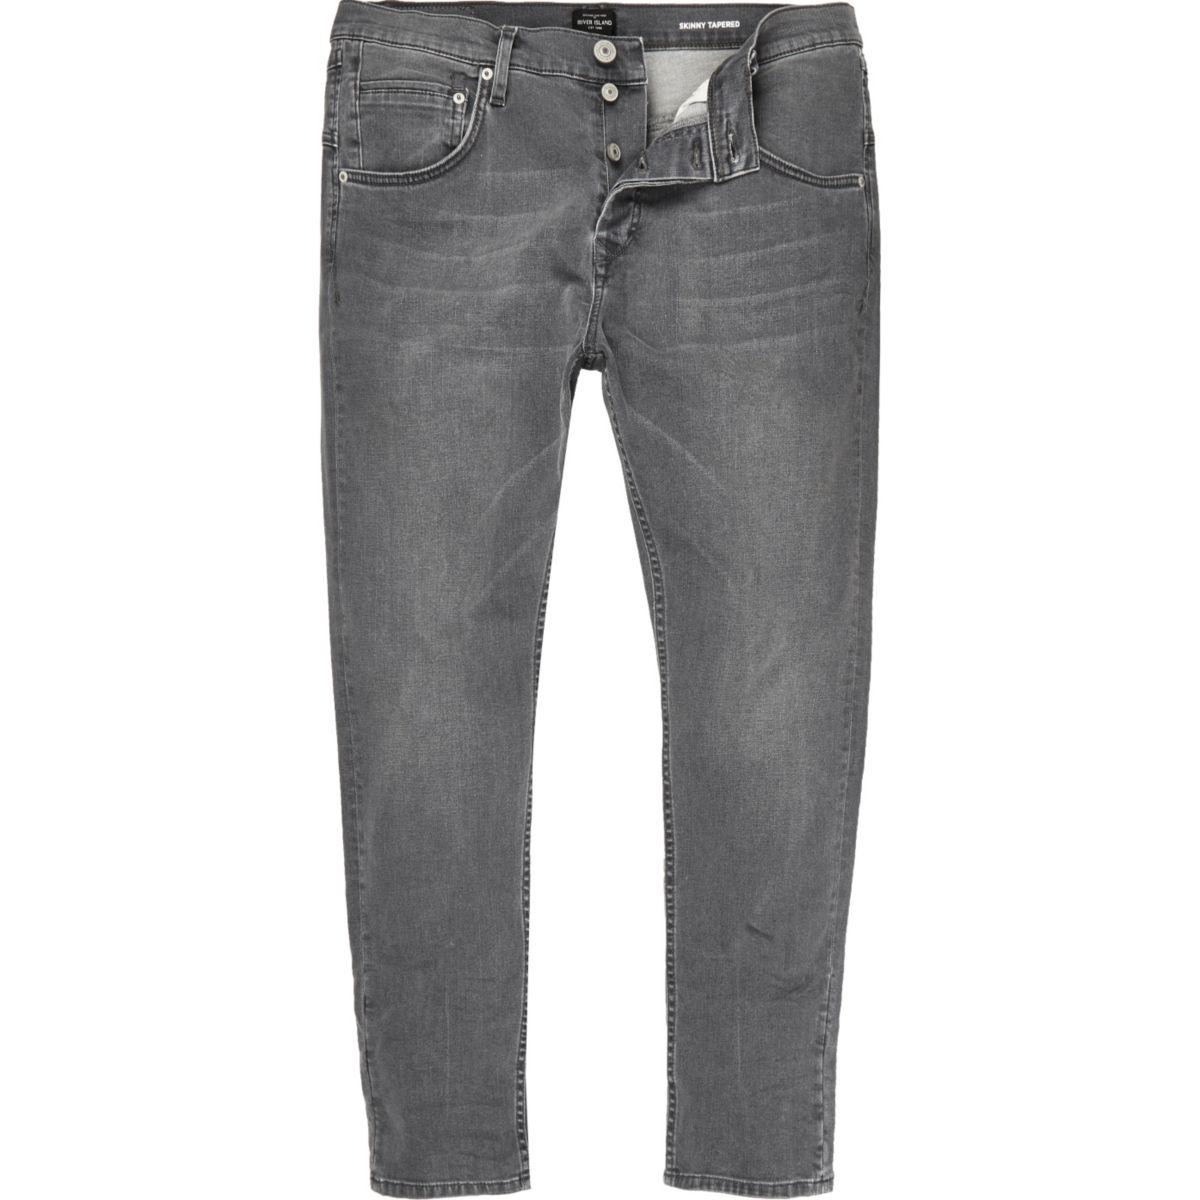 Grey skinny tapered jeans